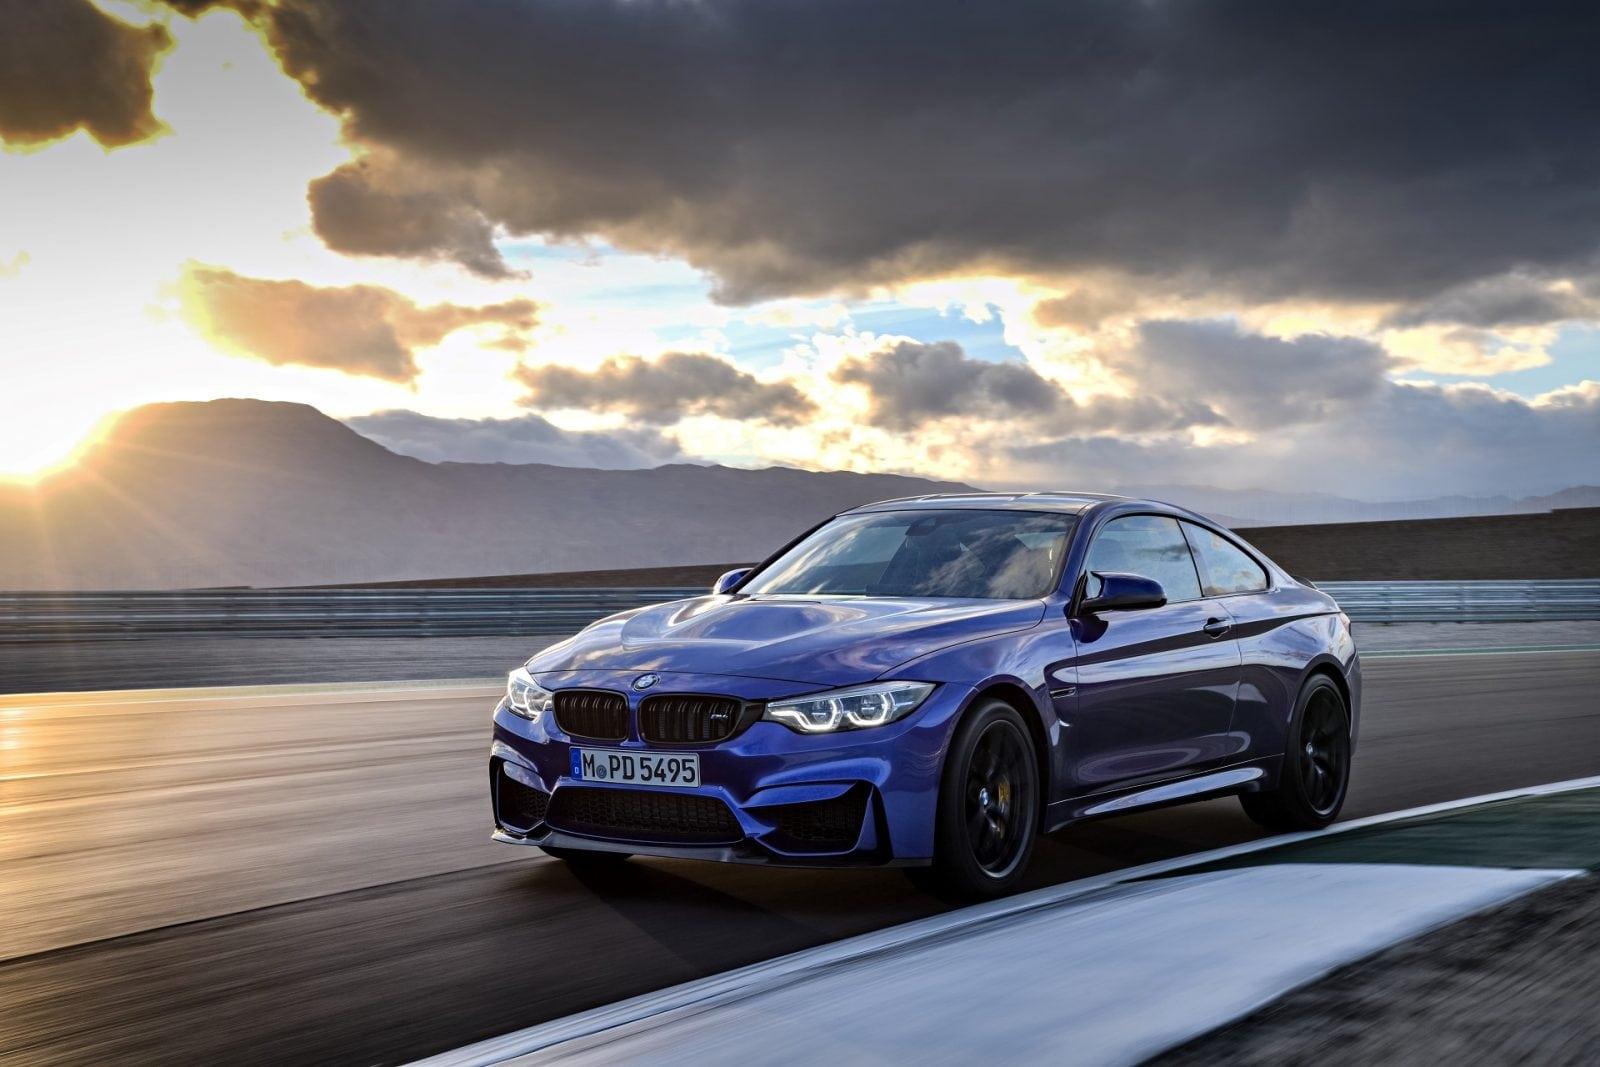 BMW M4 CS 2017 San Marino Blue Metallic